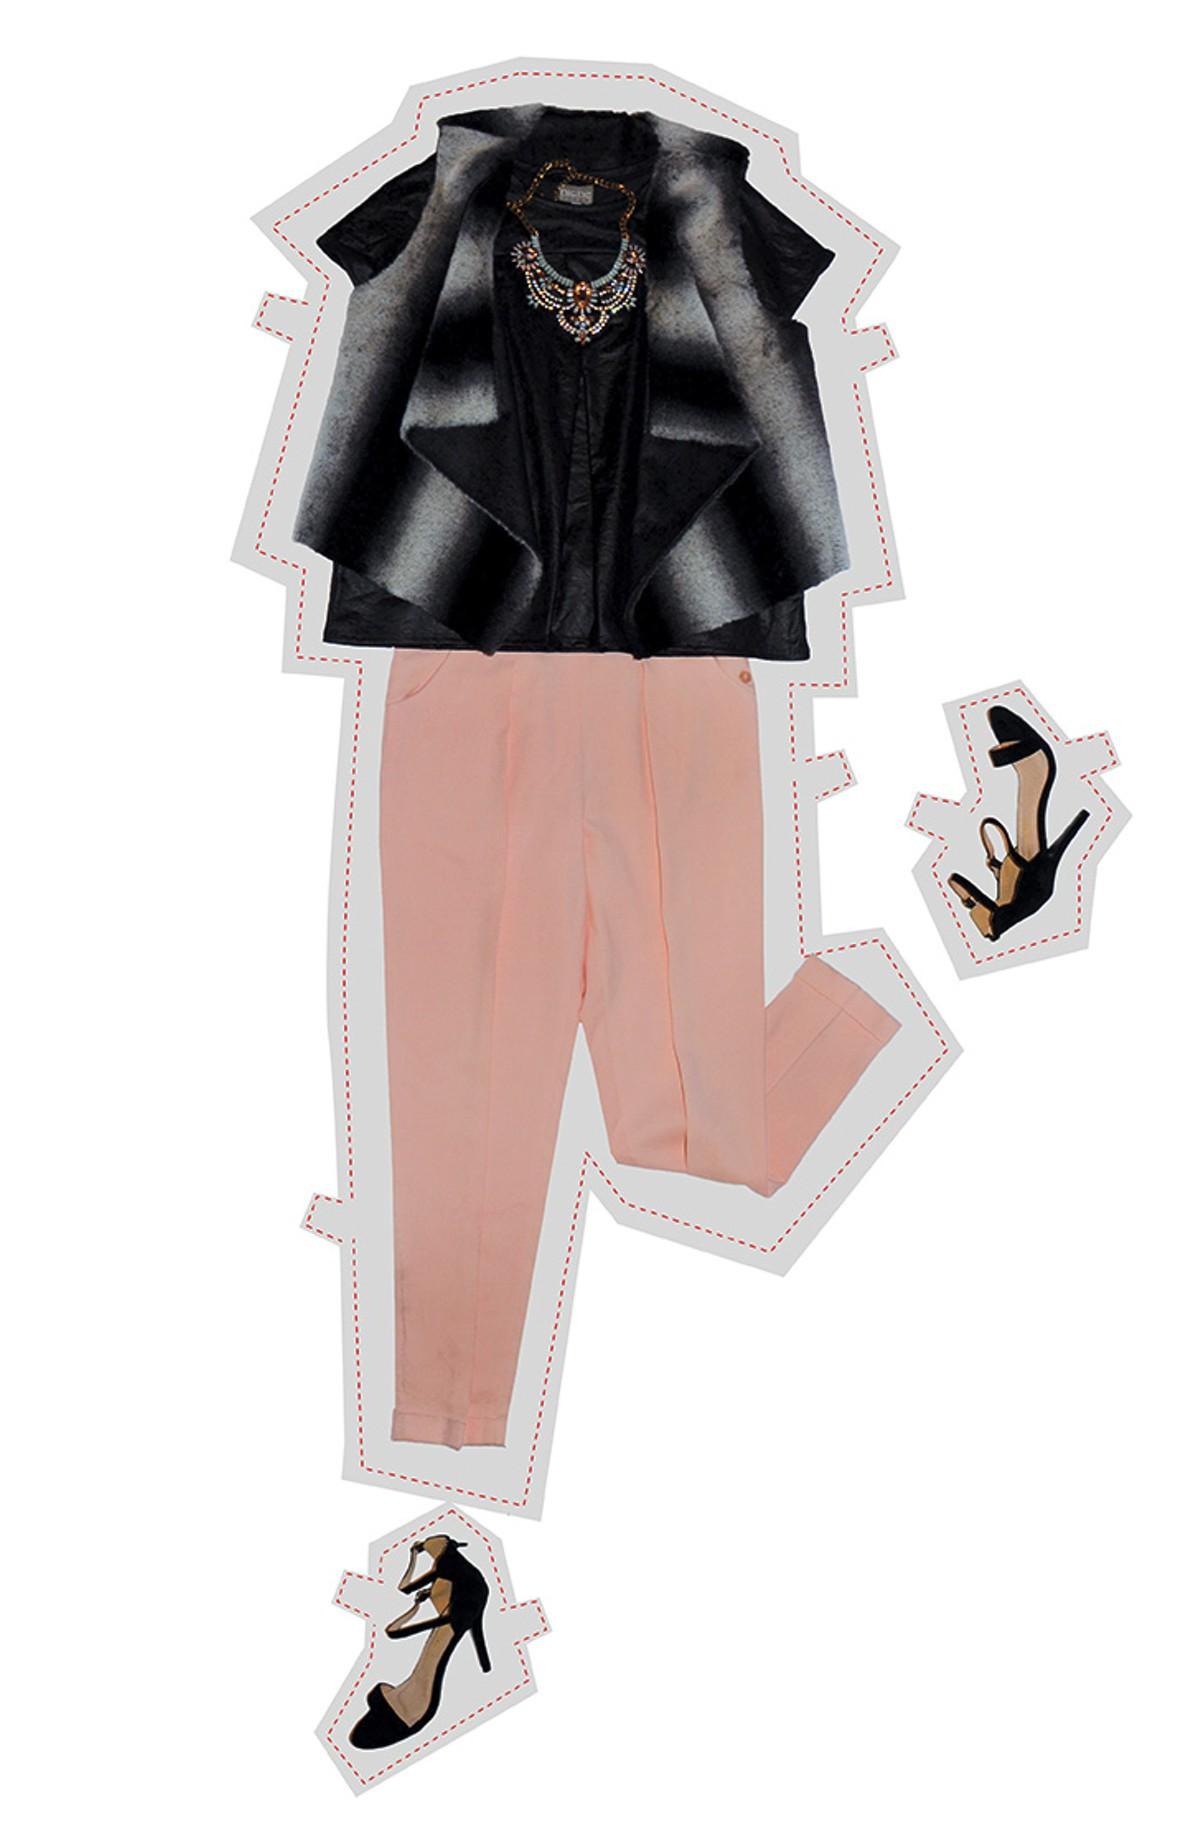 sacc-outfits-2.jpg